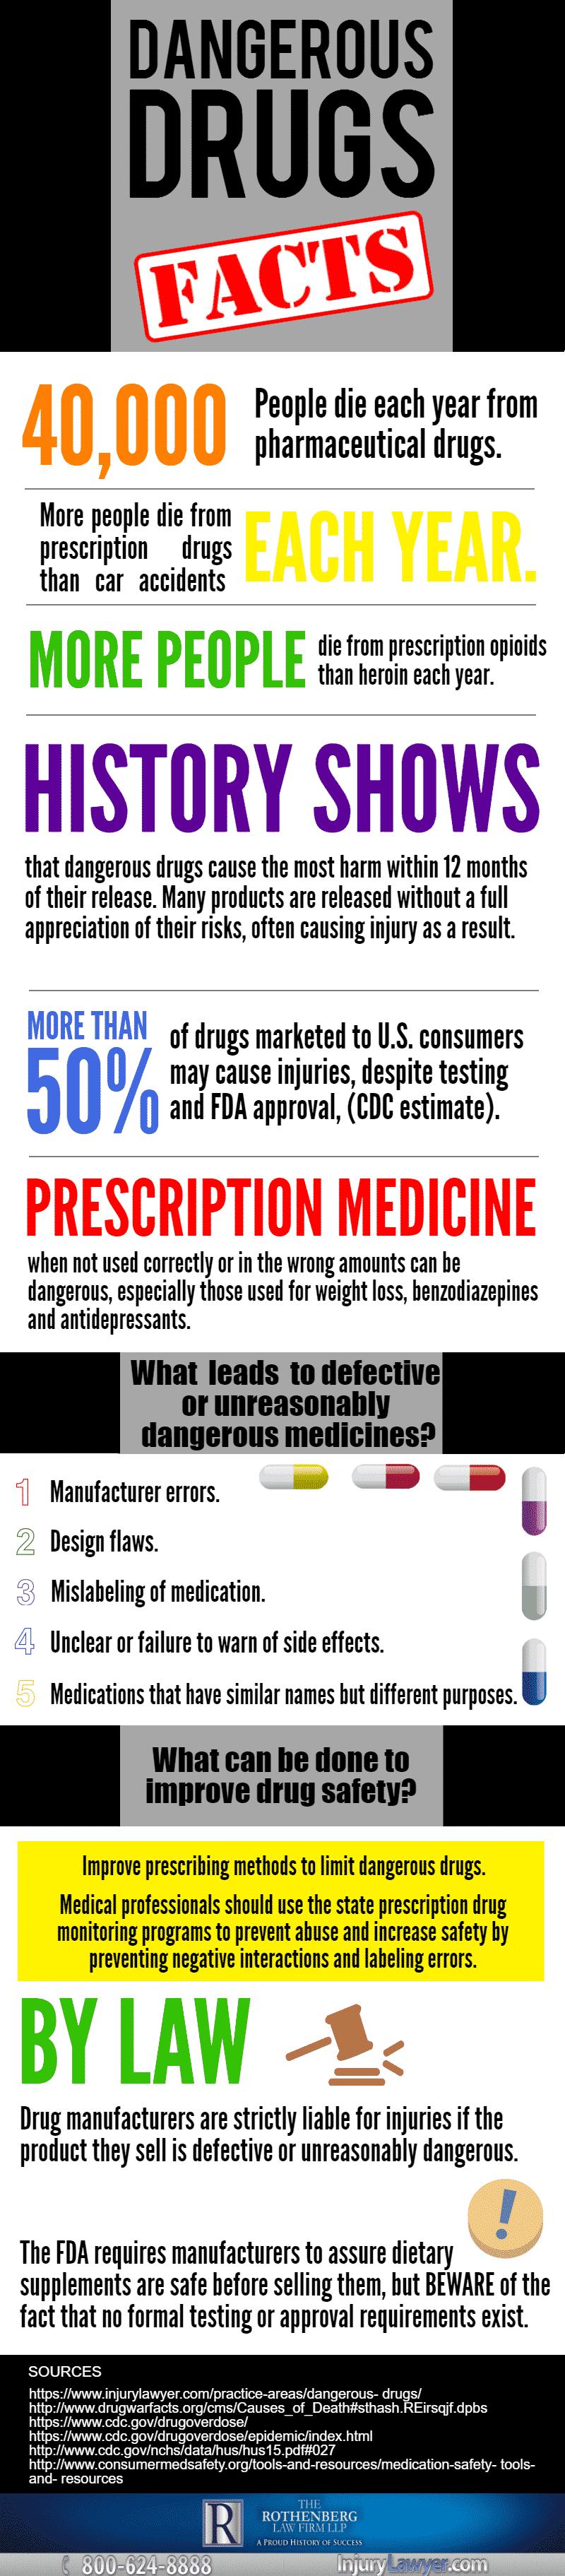 Dangerous Drugs Infographic